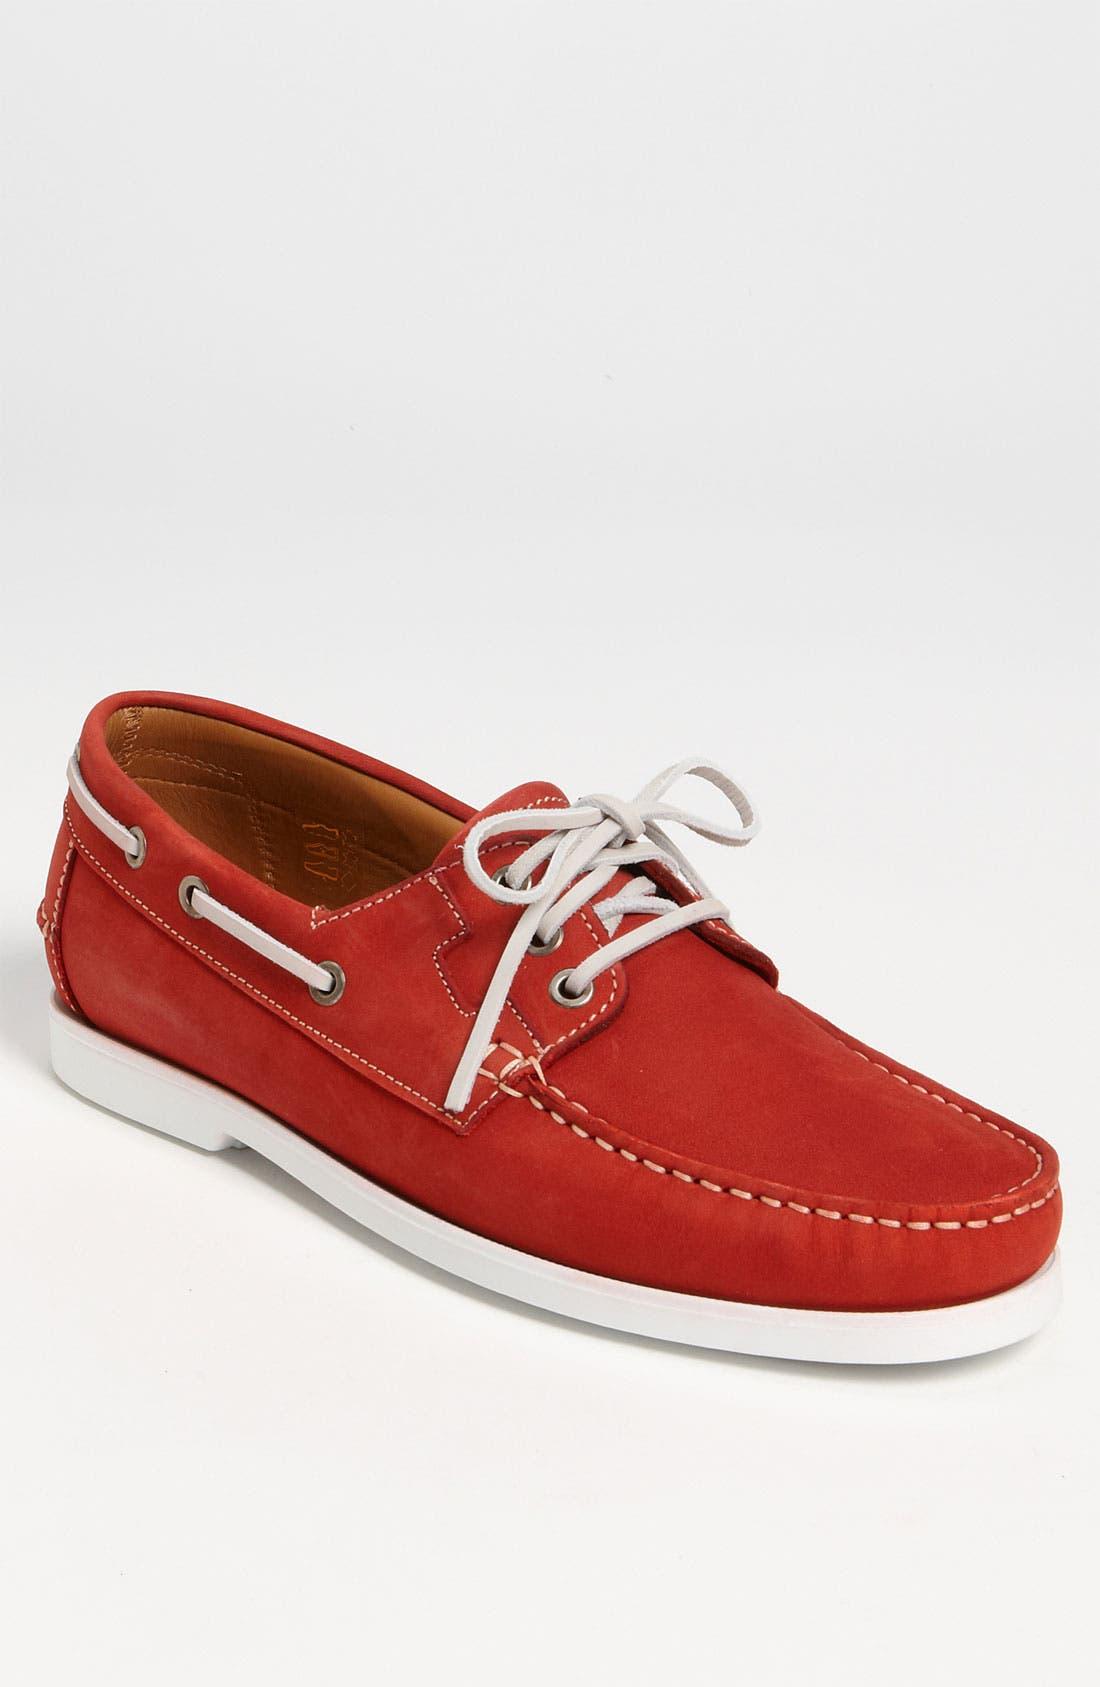 Main Image - Hunter 'Walt' Boat Shoe